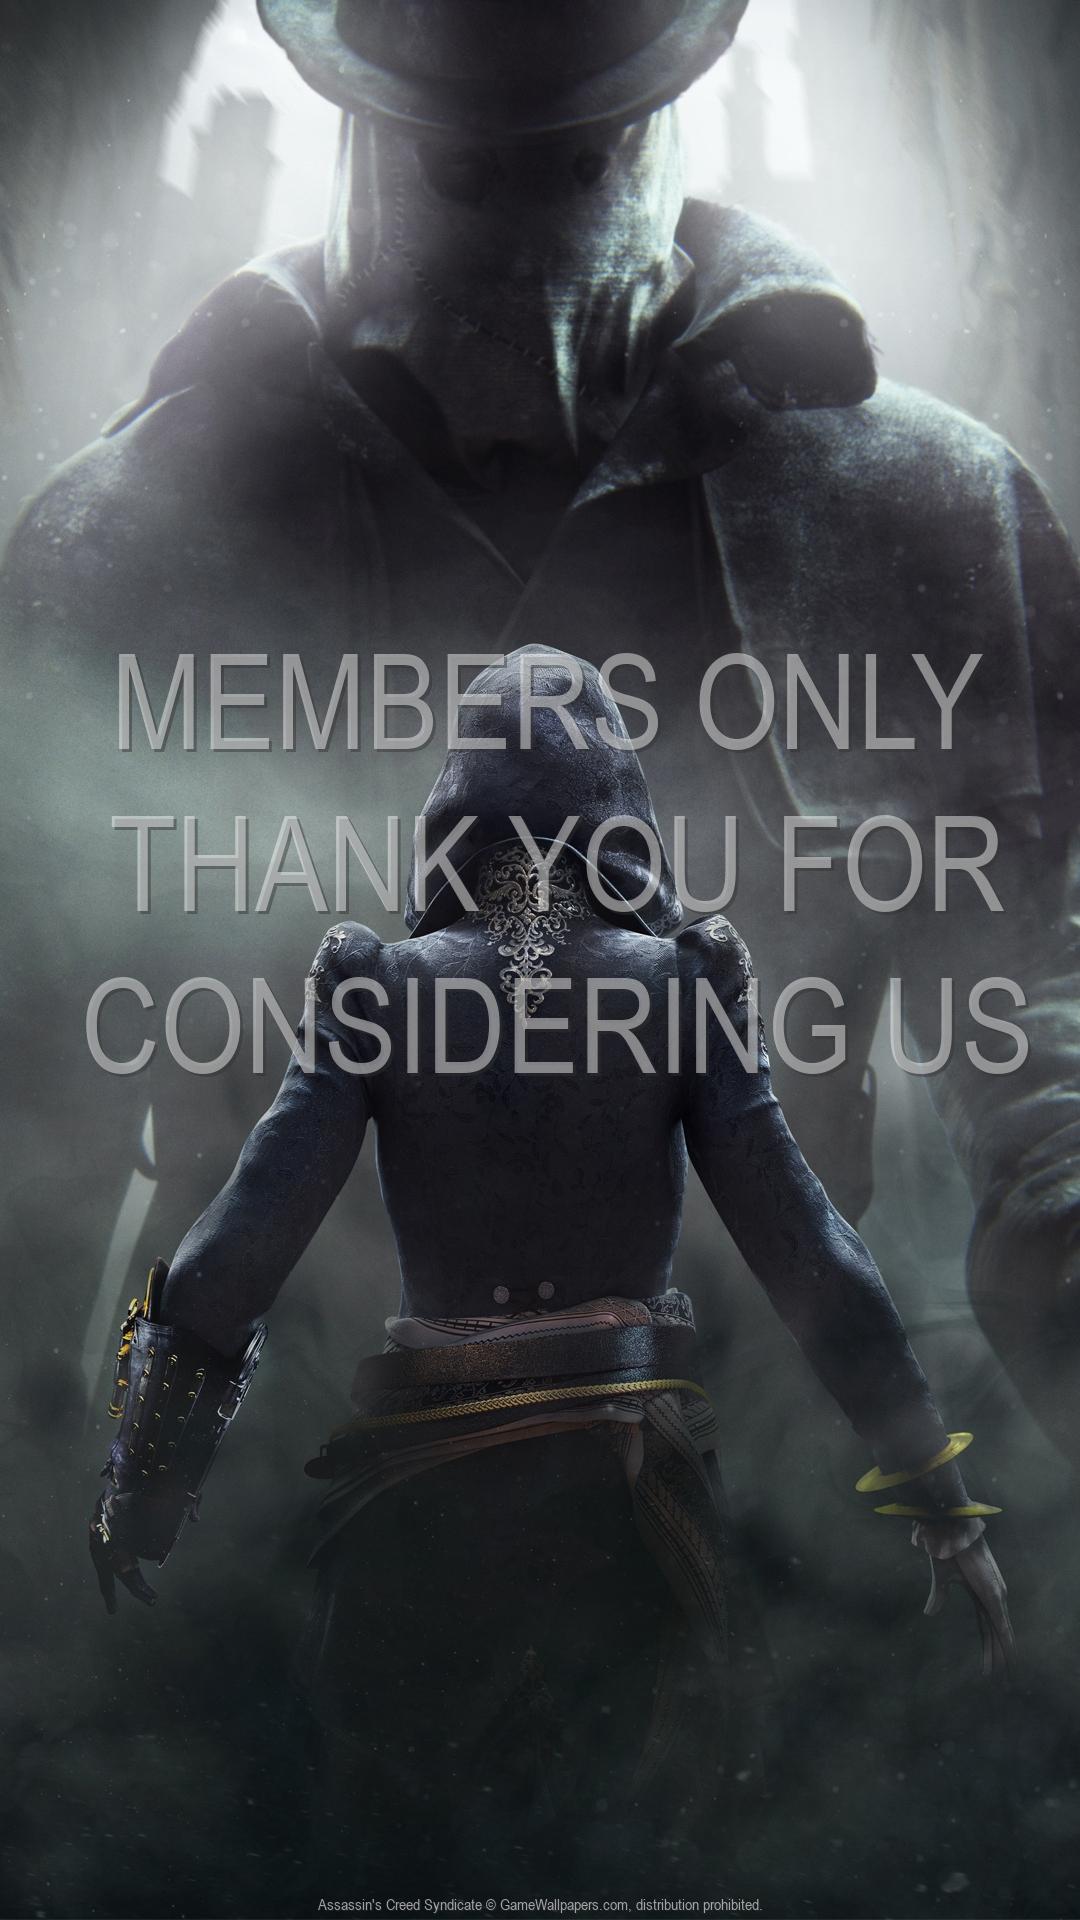 Assassin's Creed: Syndicate 1920x1080 Handy Hintergrundbild 23